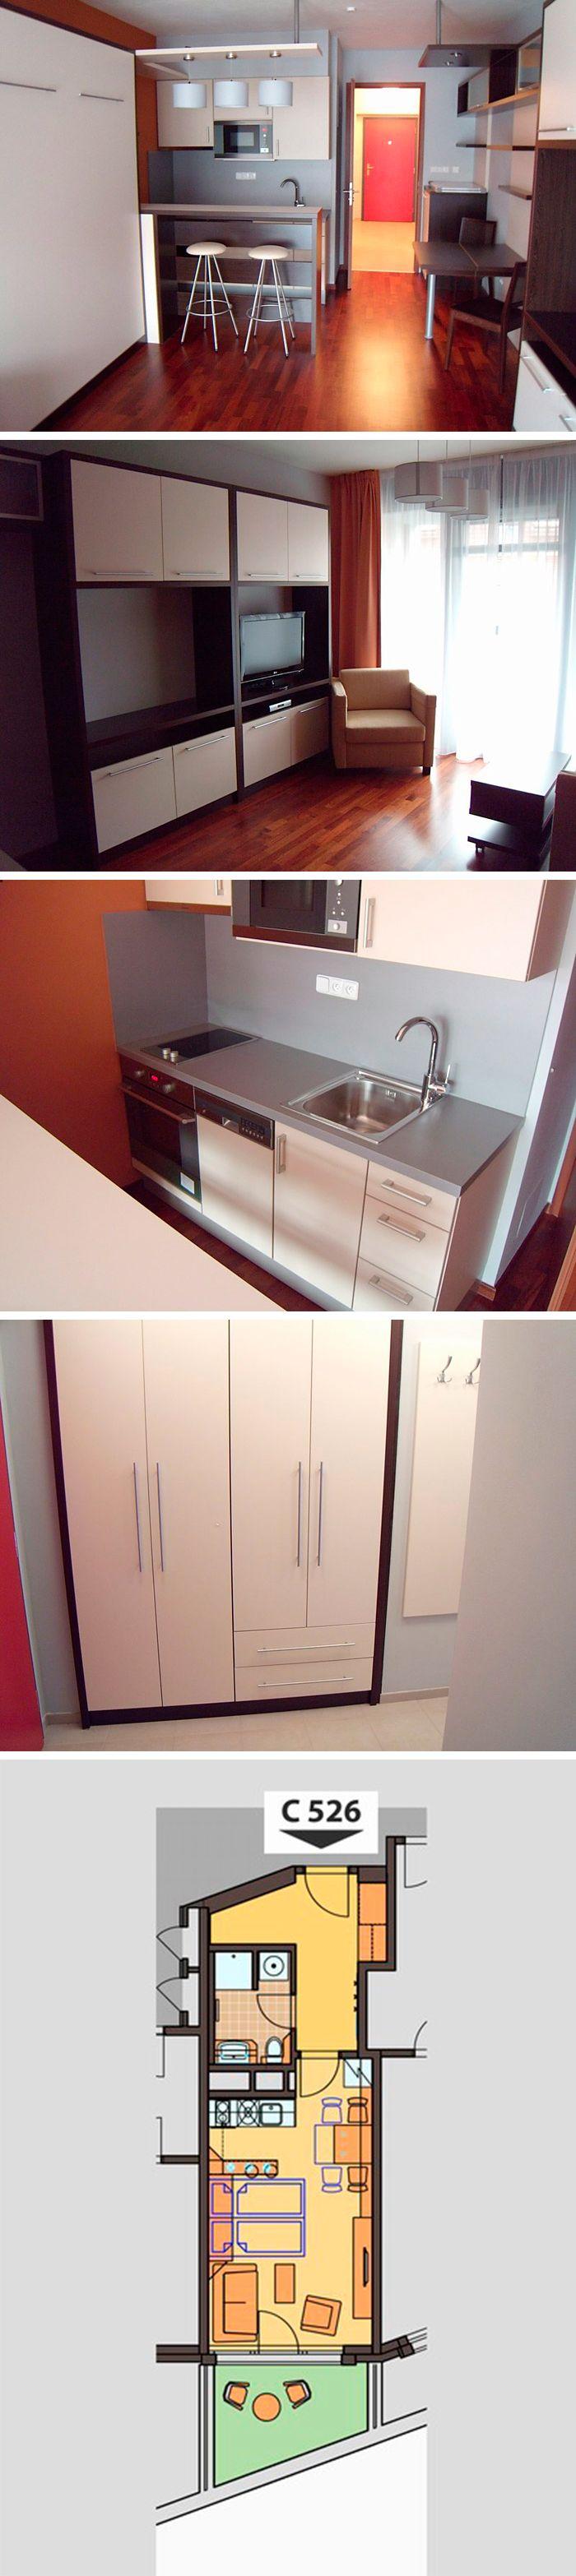 C.526 apartment for rent in Prague: dispozition: 1+kk, floor: 2, balcony, total: 39.7 m2.  Albertov Rental Apartments, Horská 2107/2d, Praha 2. Reception: +420 602 22 66 33, reception@albertov.eu, www.albertov.eu